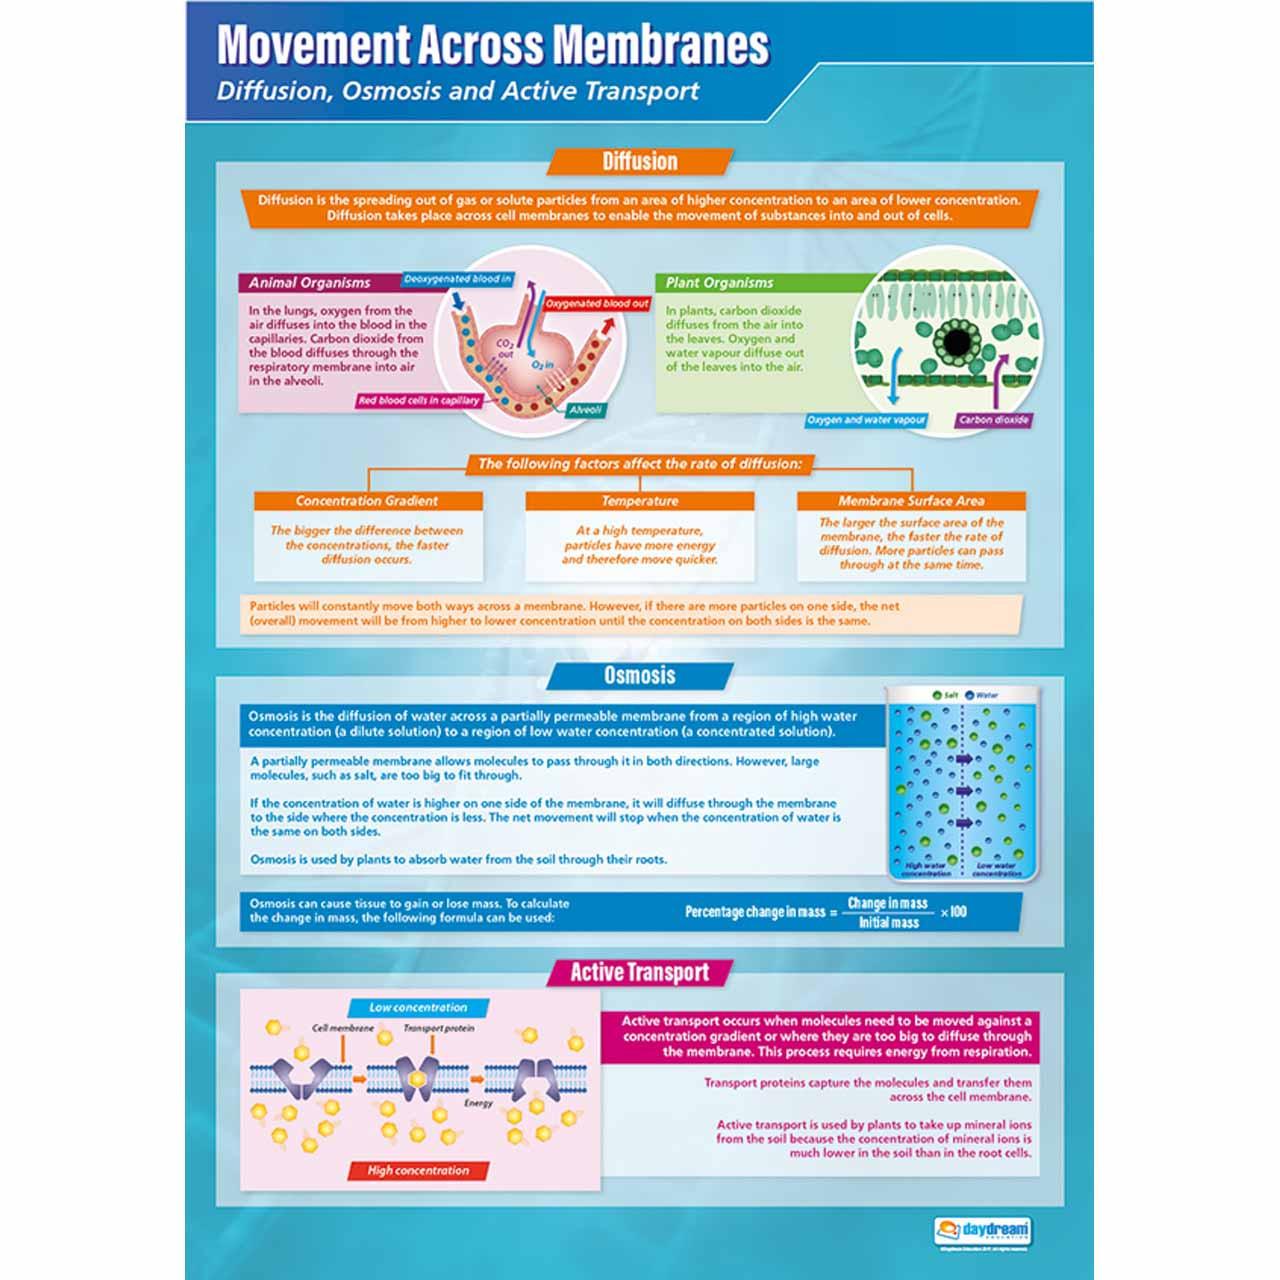 SC062L - Movement Across Membranes